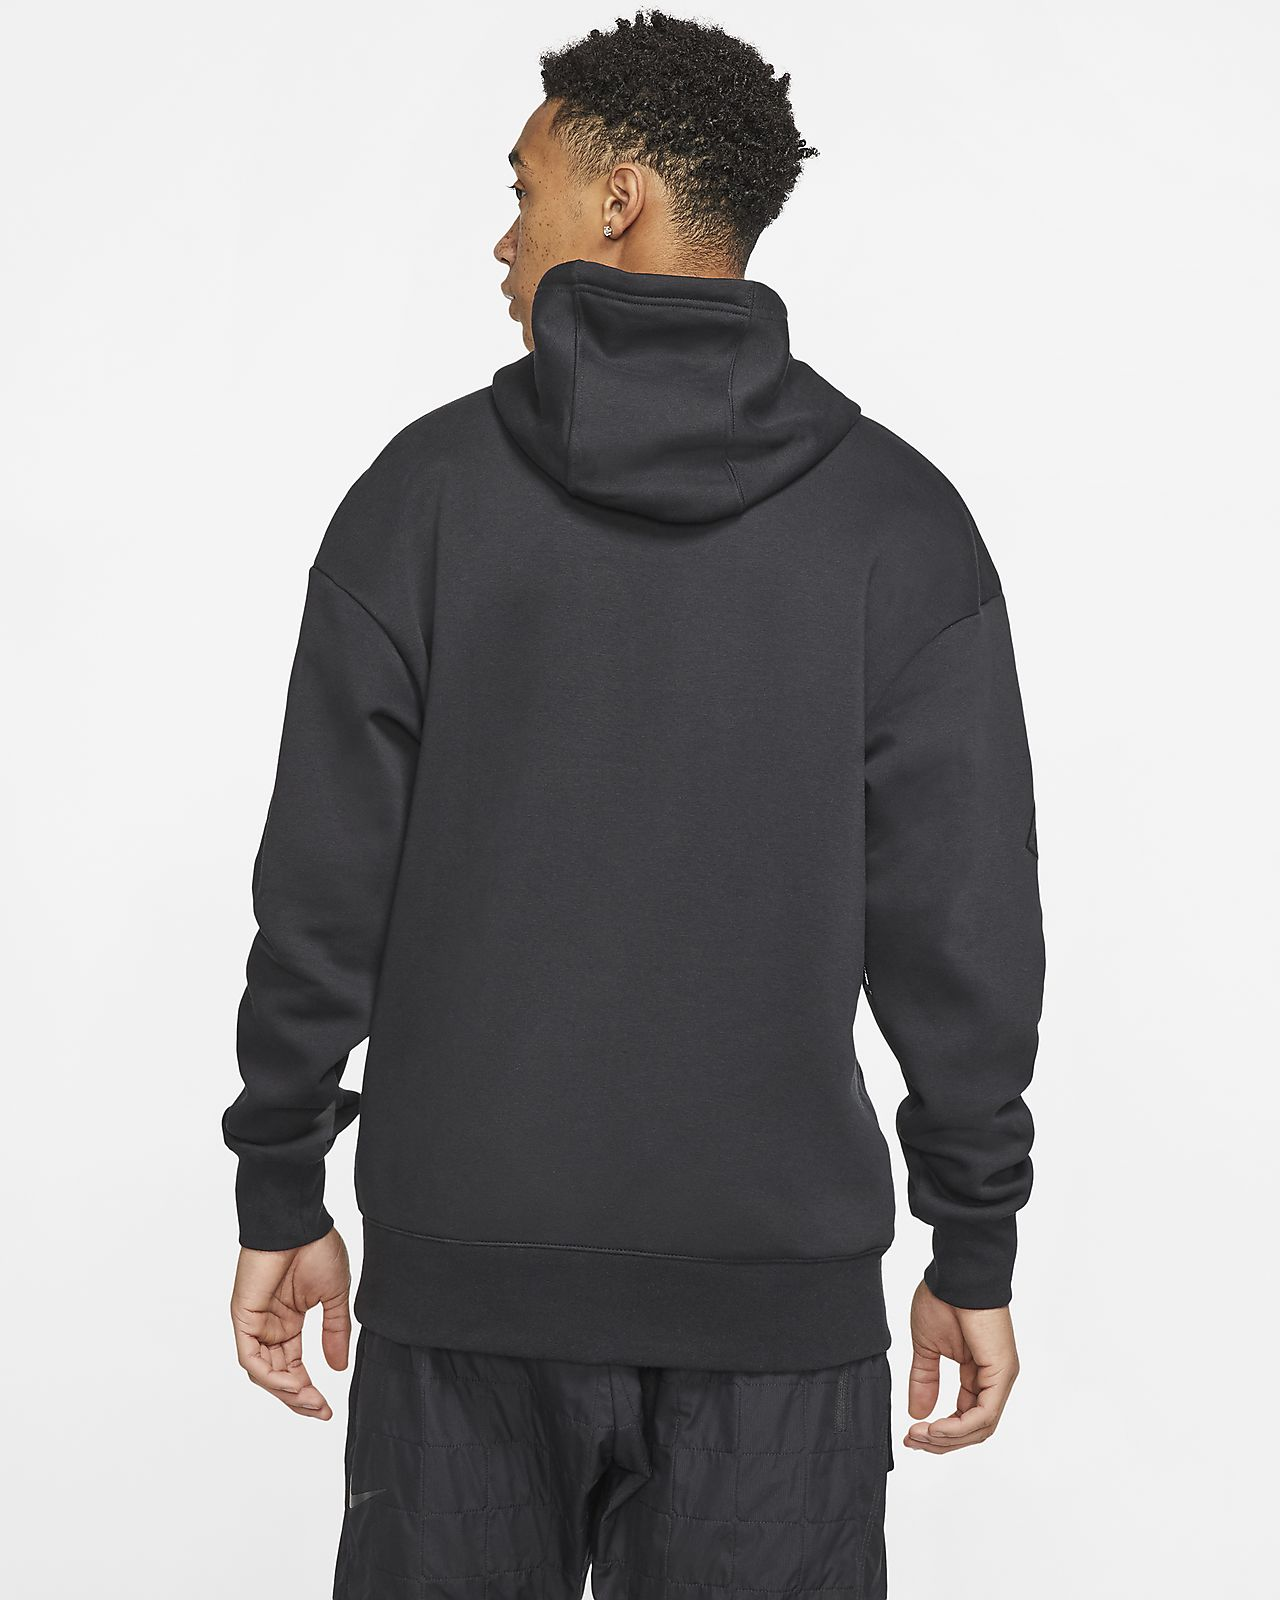 Black nike hoodie xs Zeppy.io